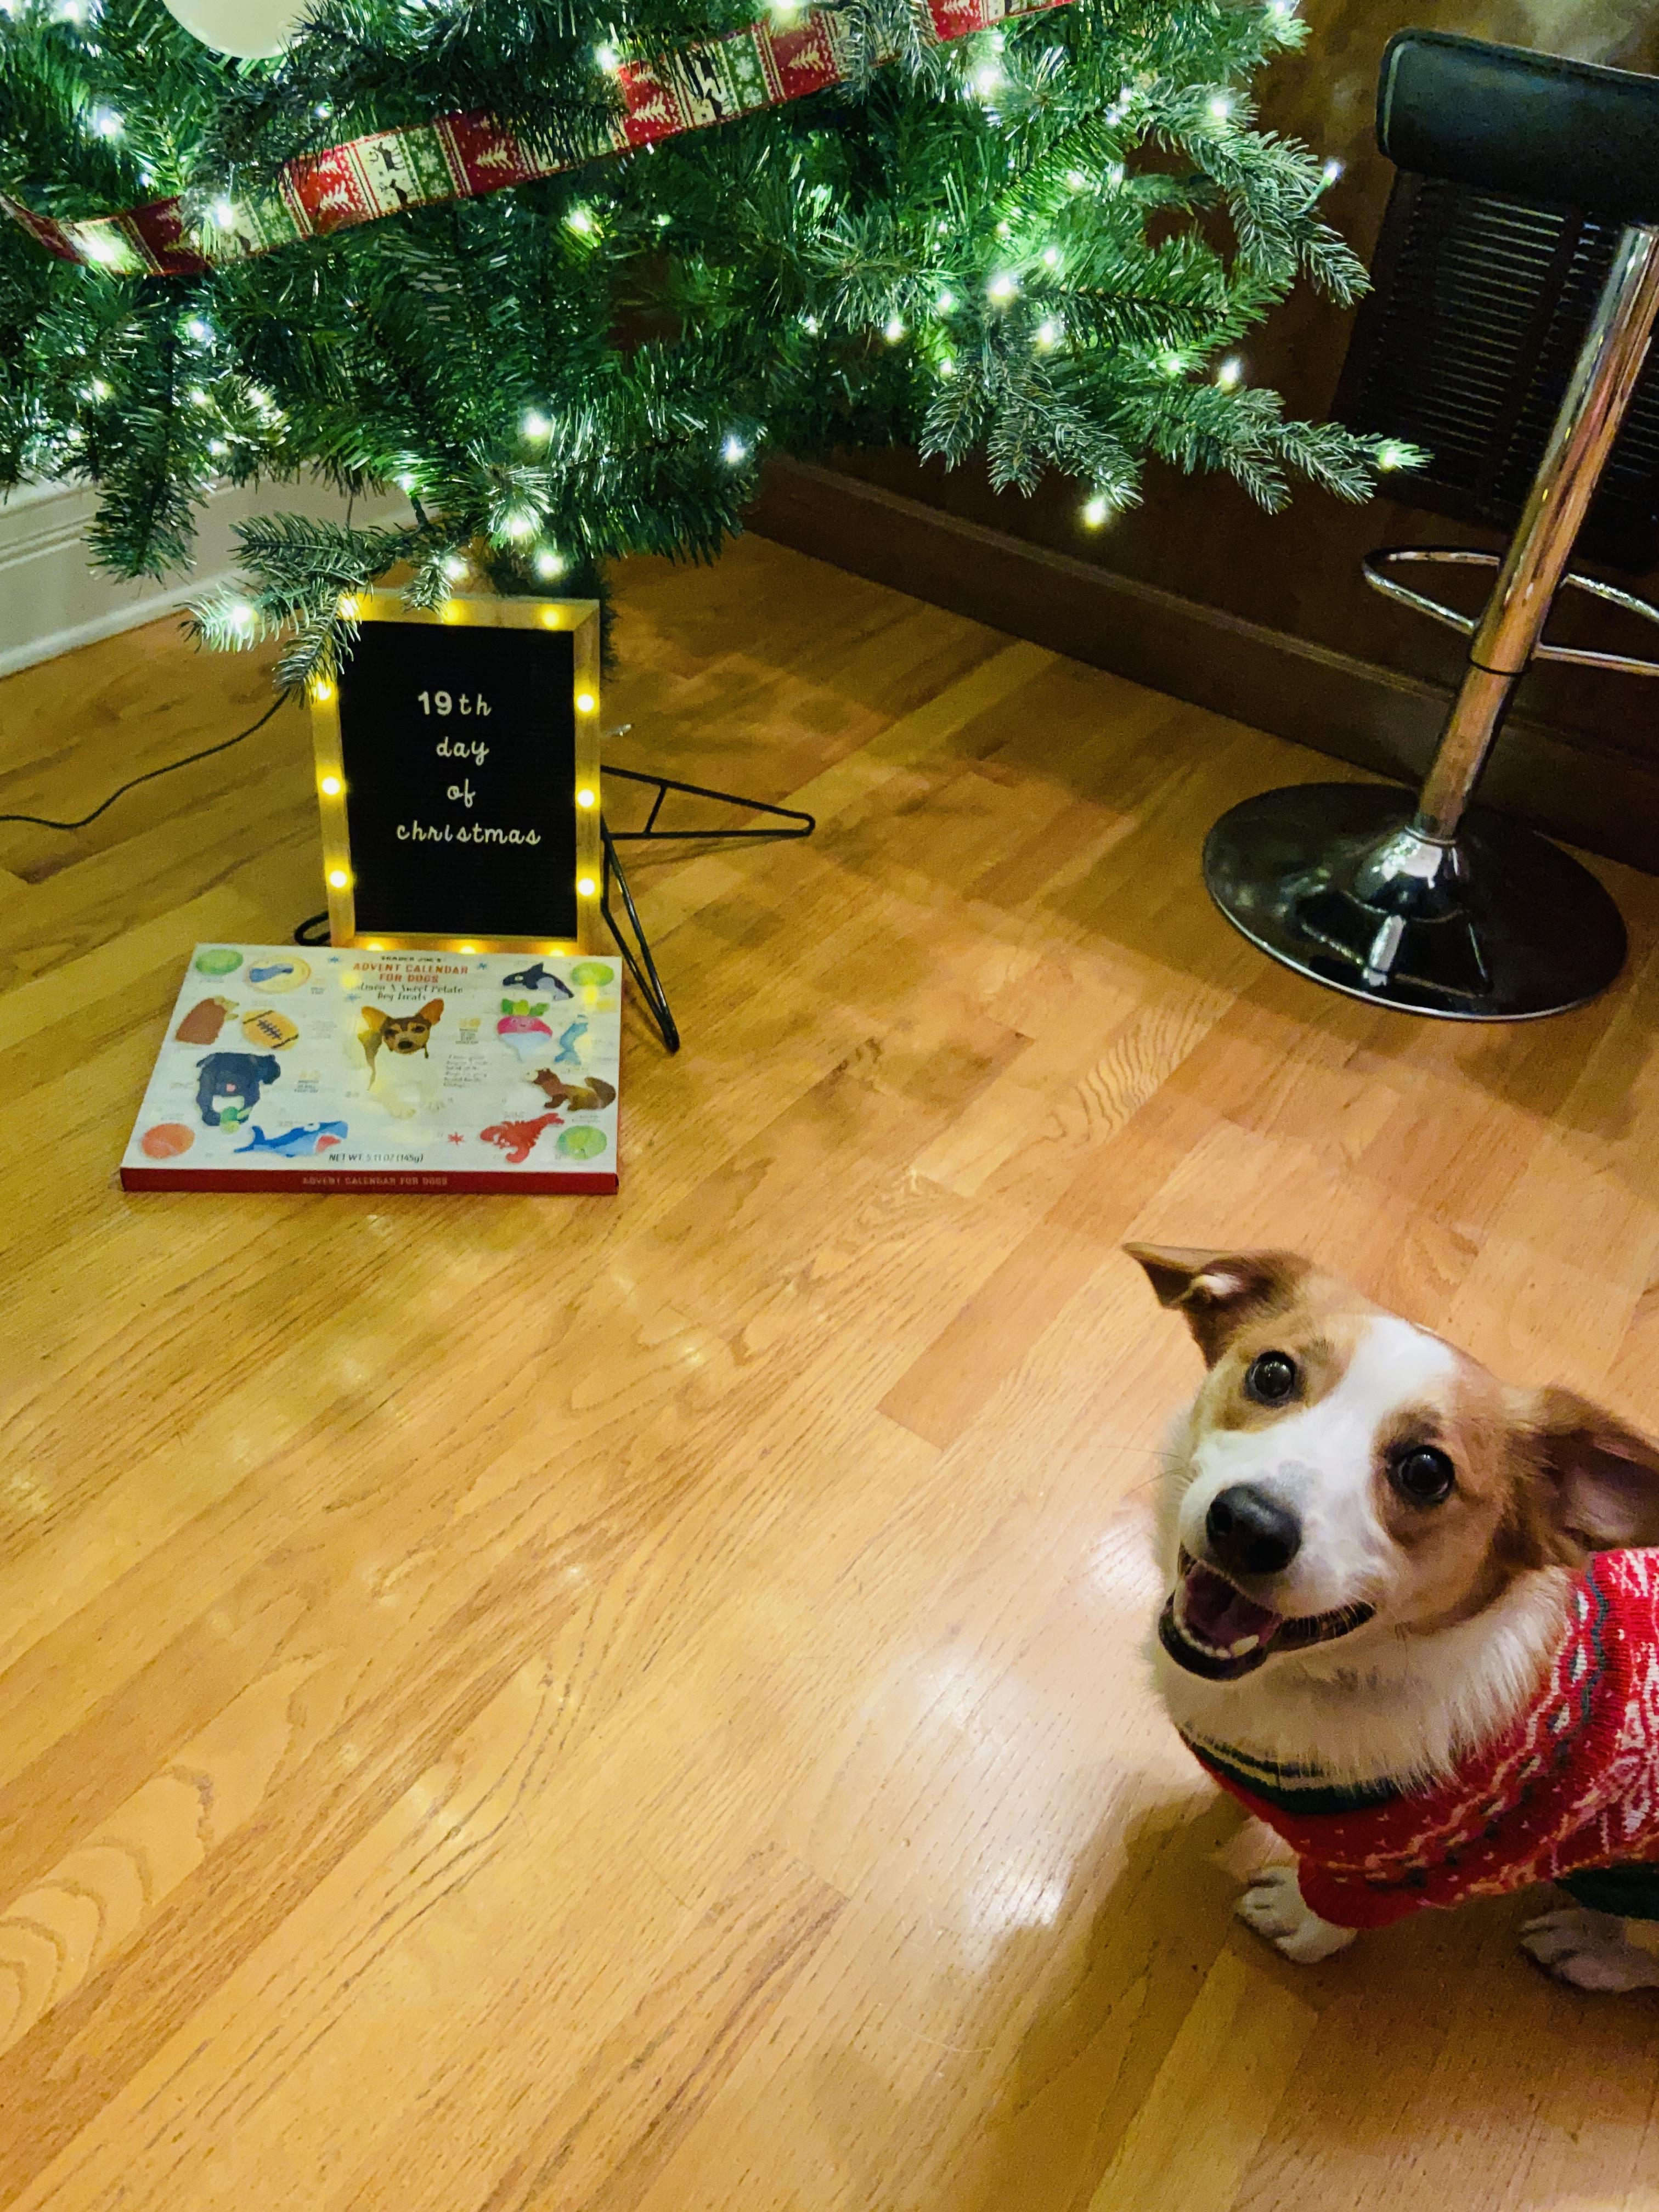 Butter wears Christmas sweater